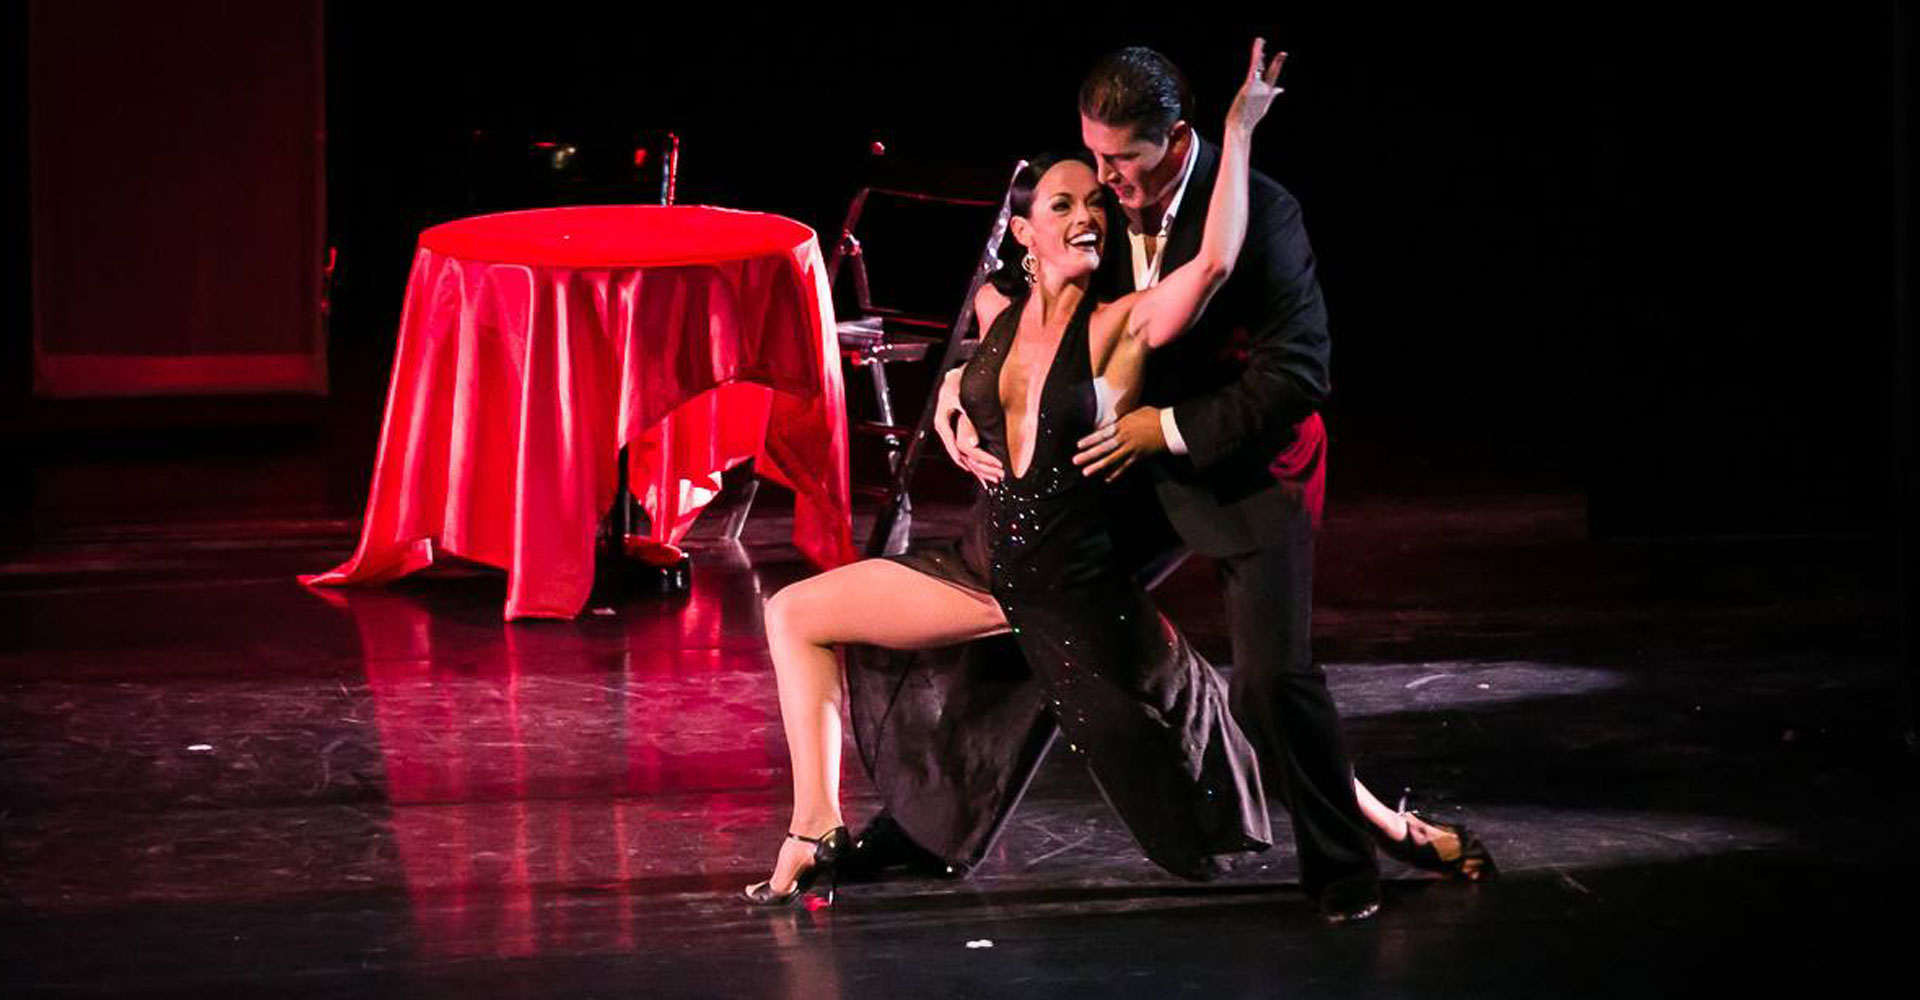 mitico-tango-rev_slider-05